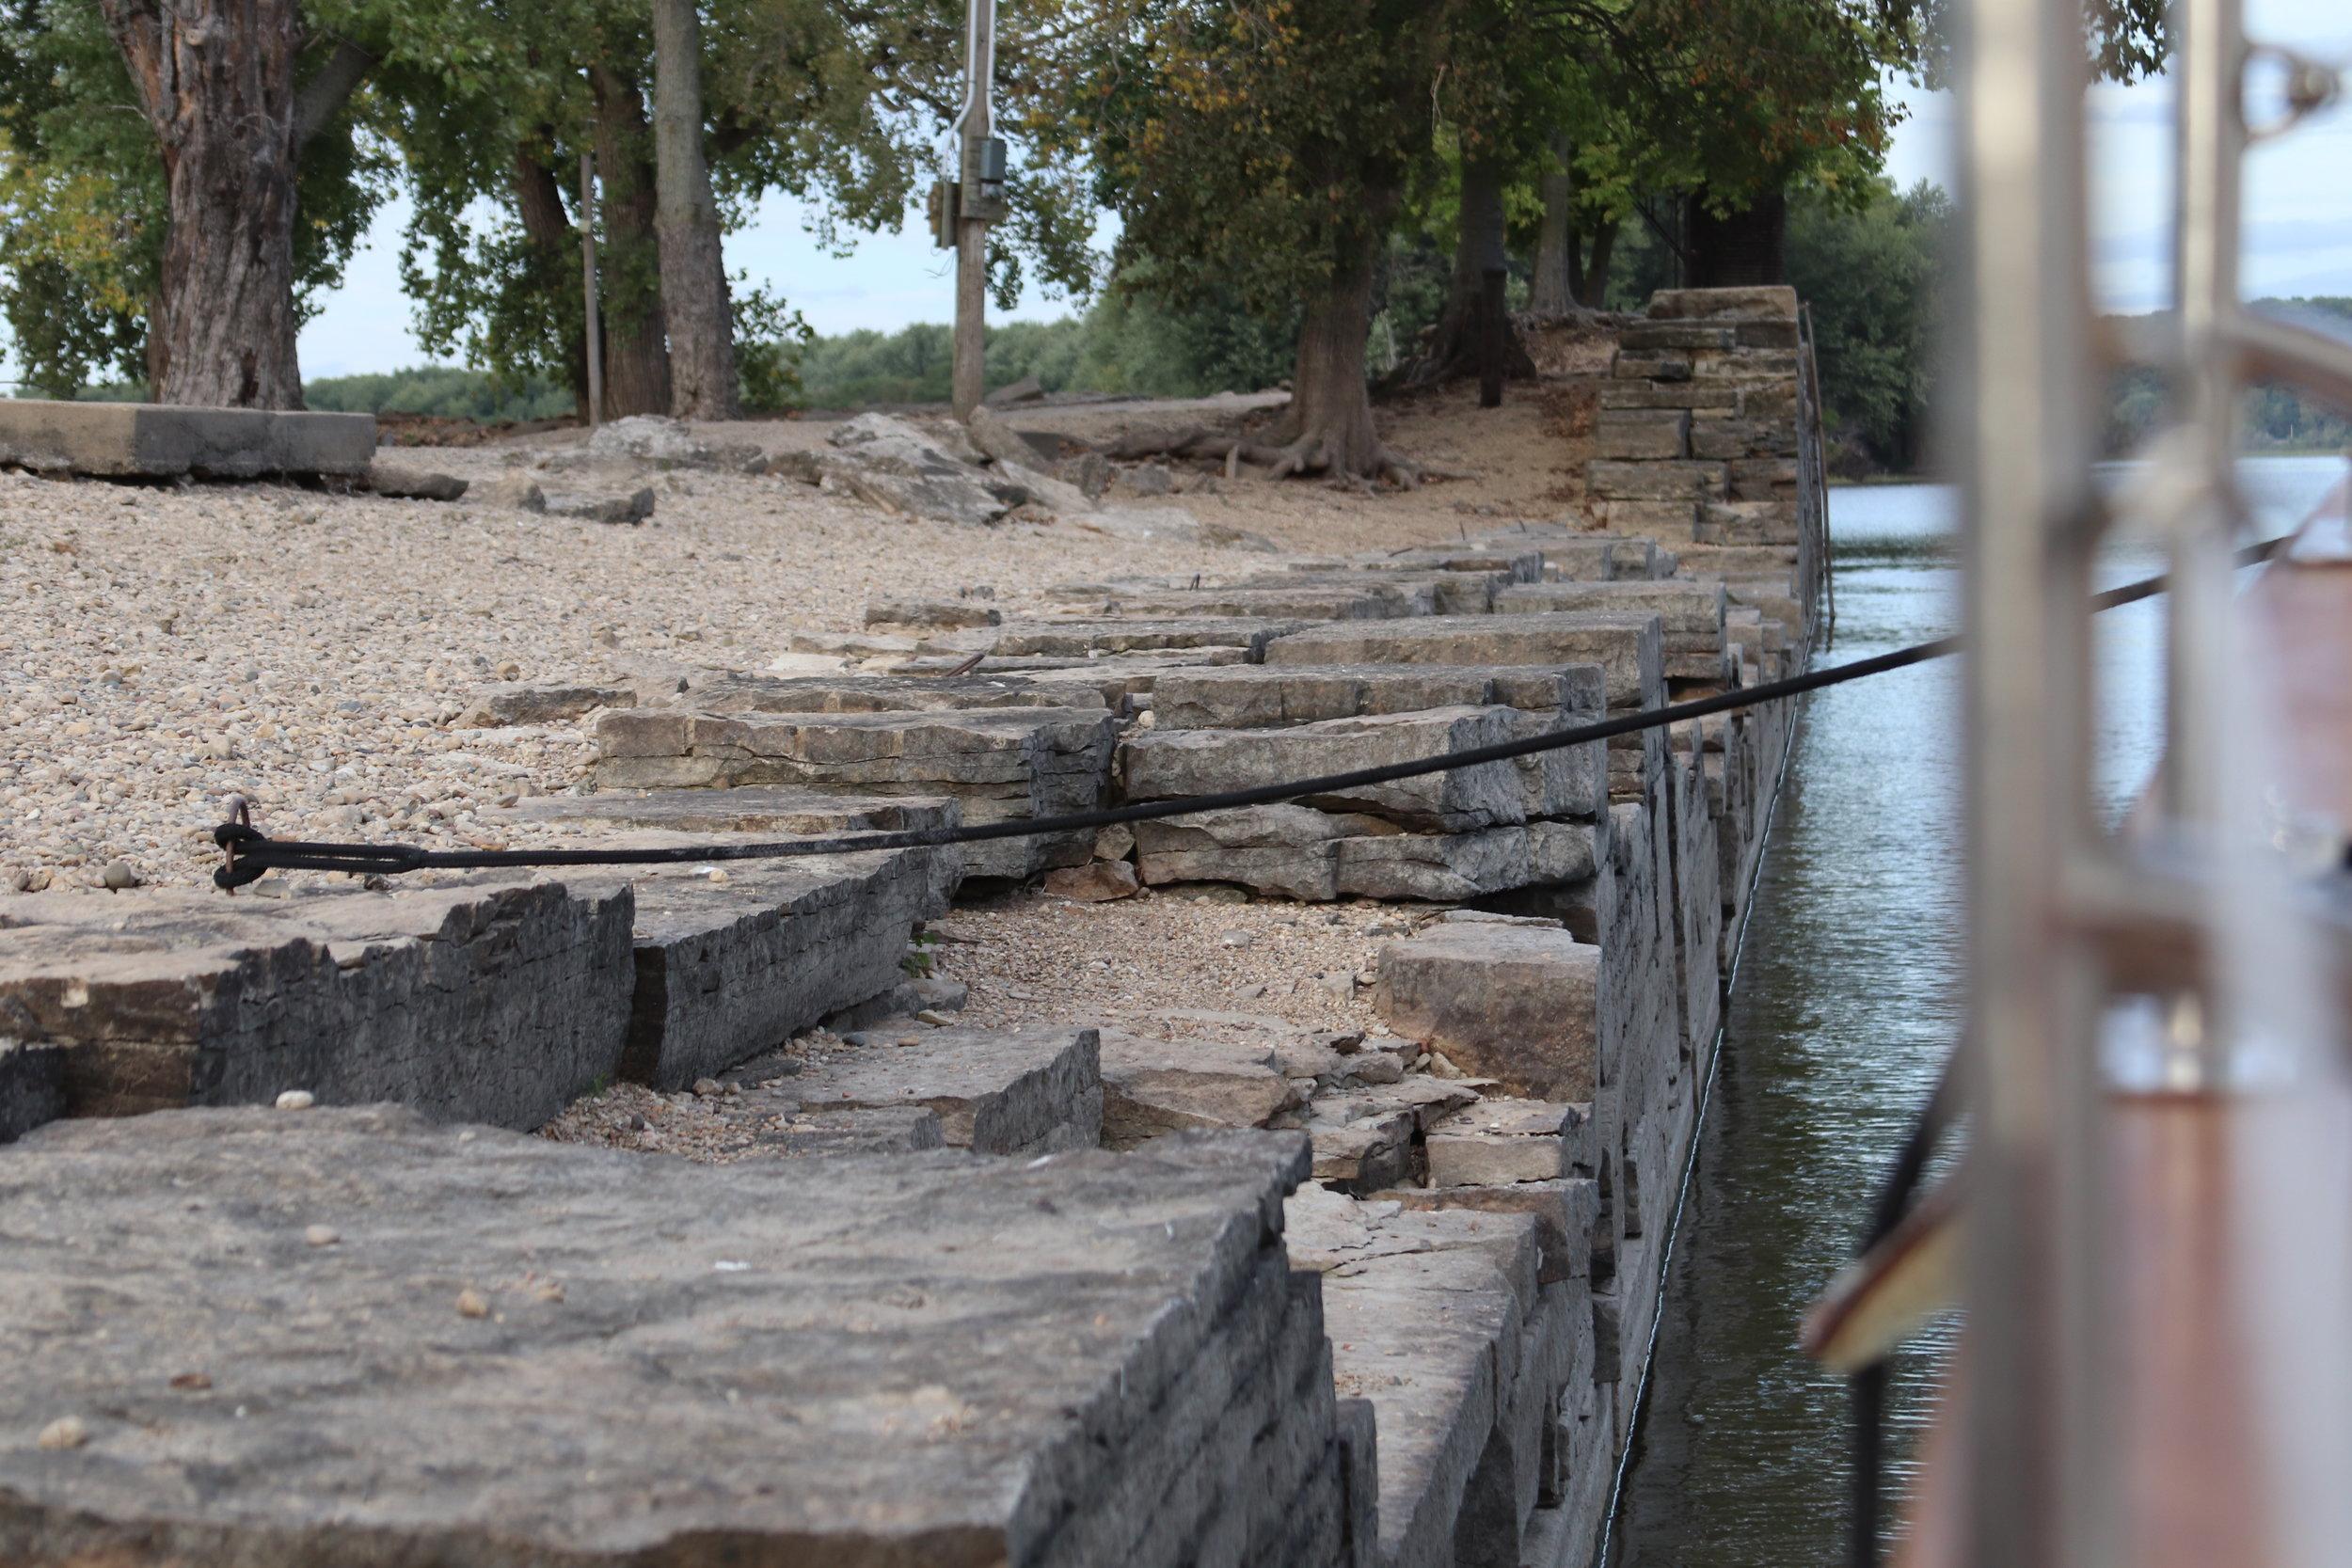 Crumbling lock walls and rebar loops